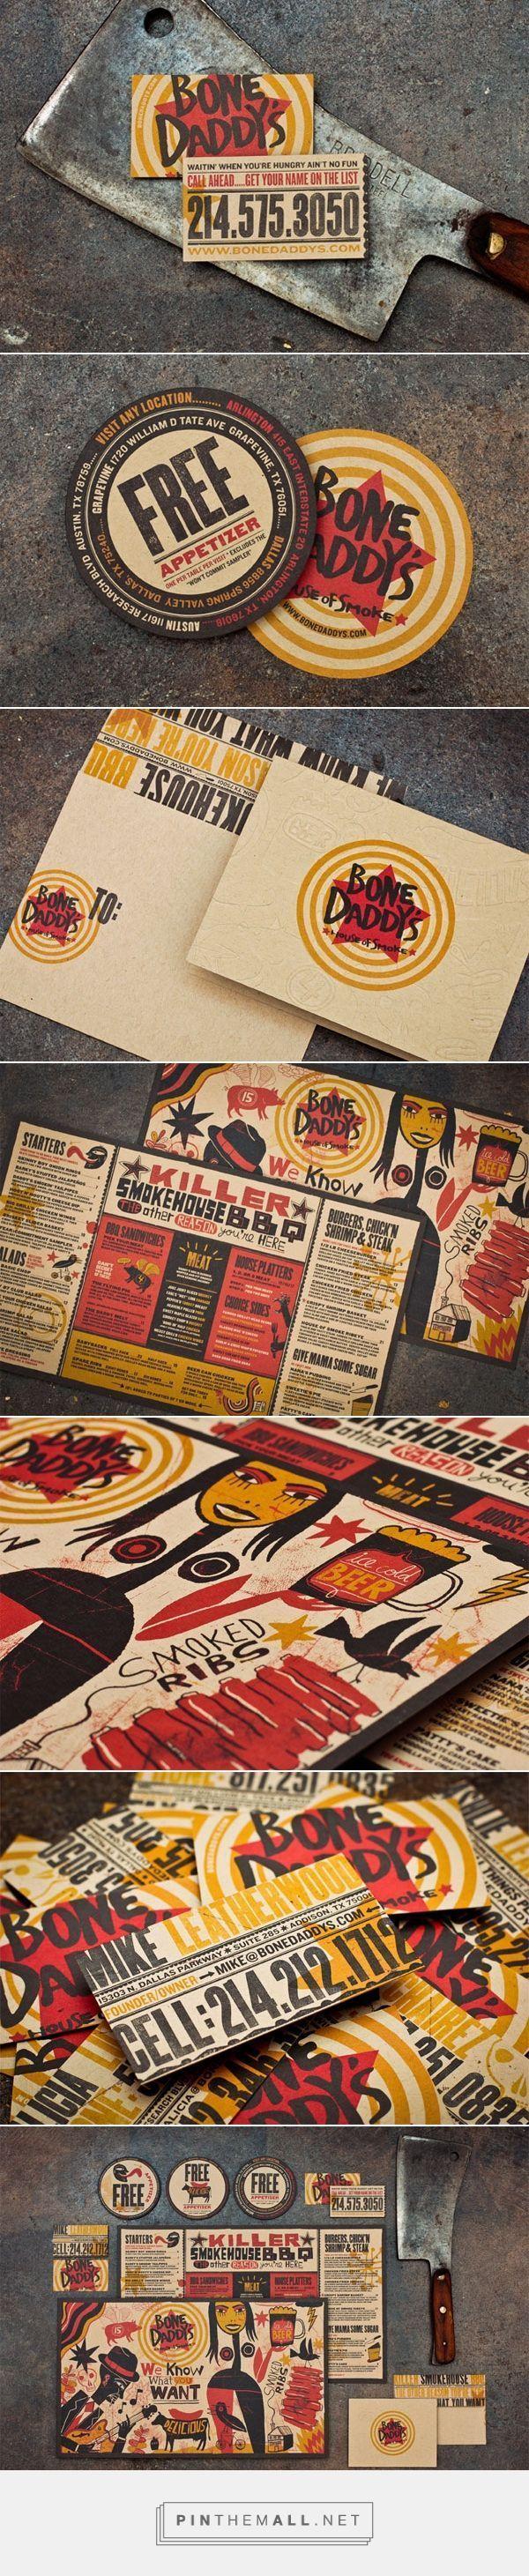 Food infographic  Food infographic  Food infographic  FPO: Bone Daddy's BBQ Restaurant Brandin